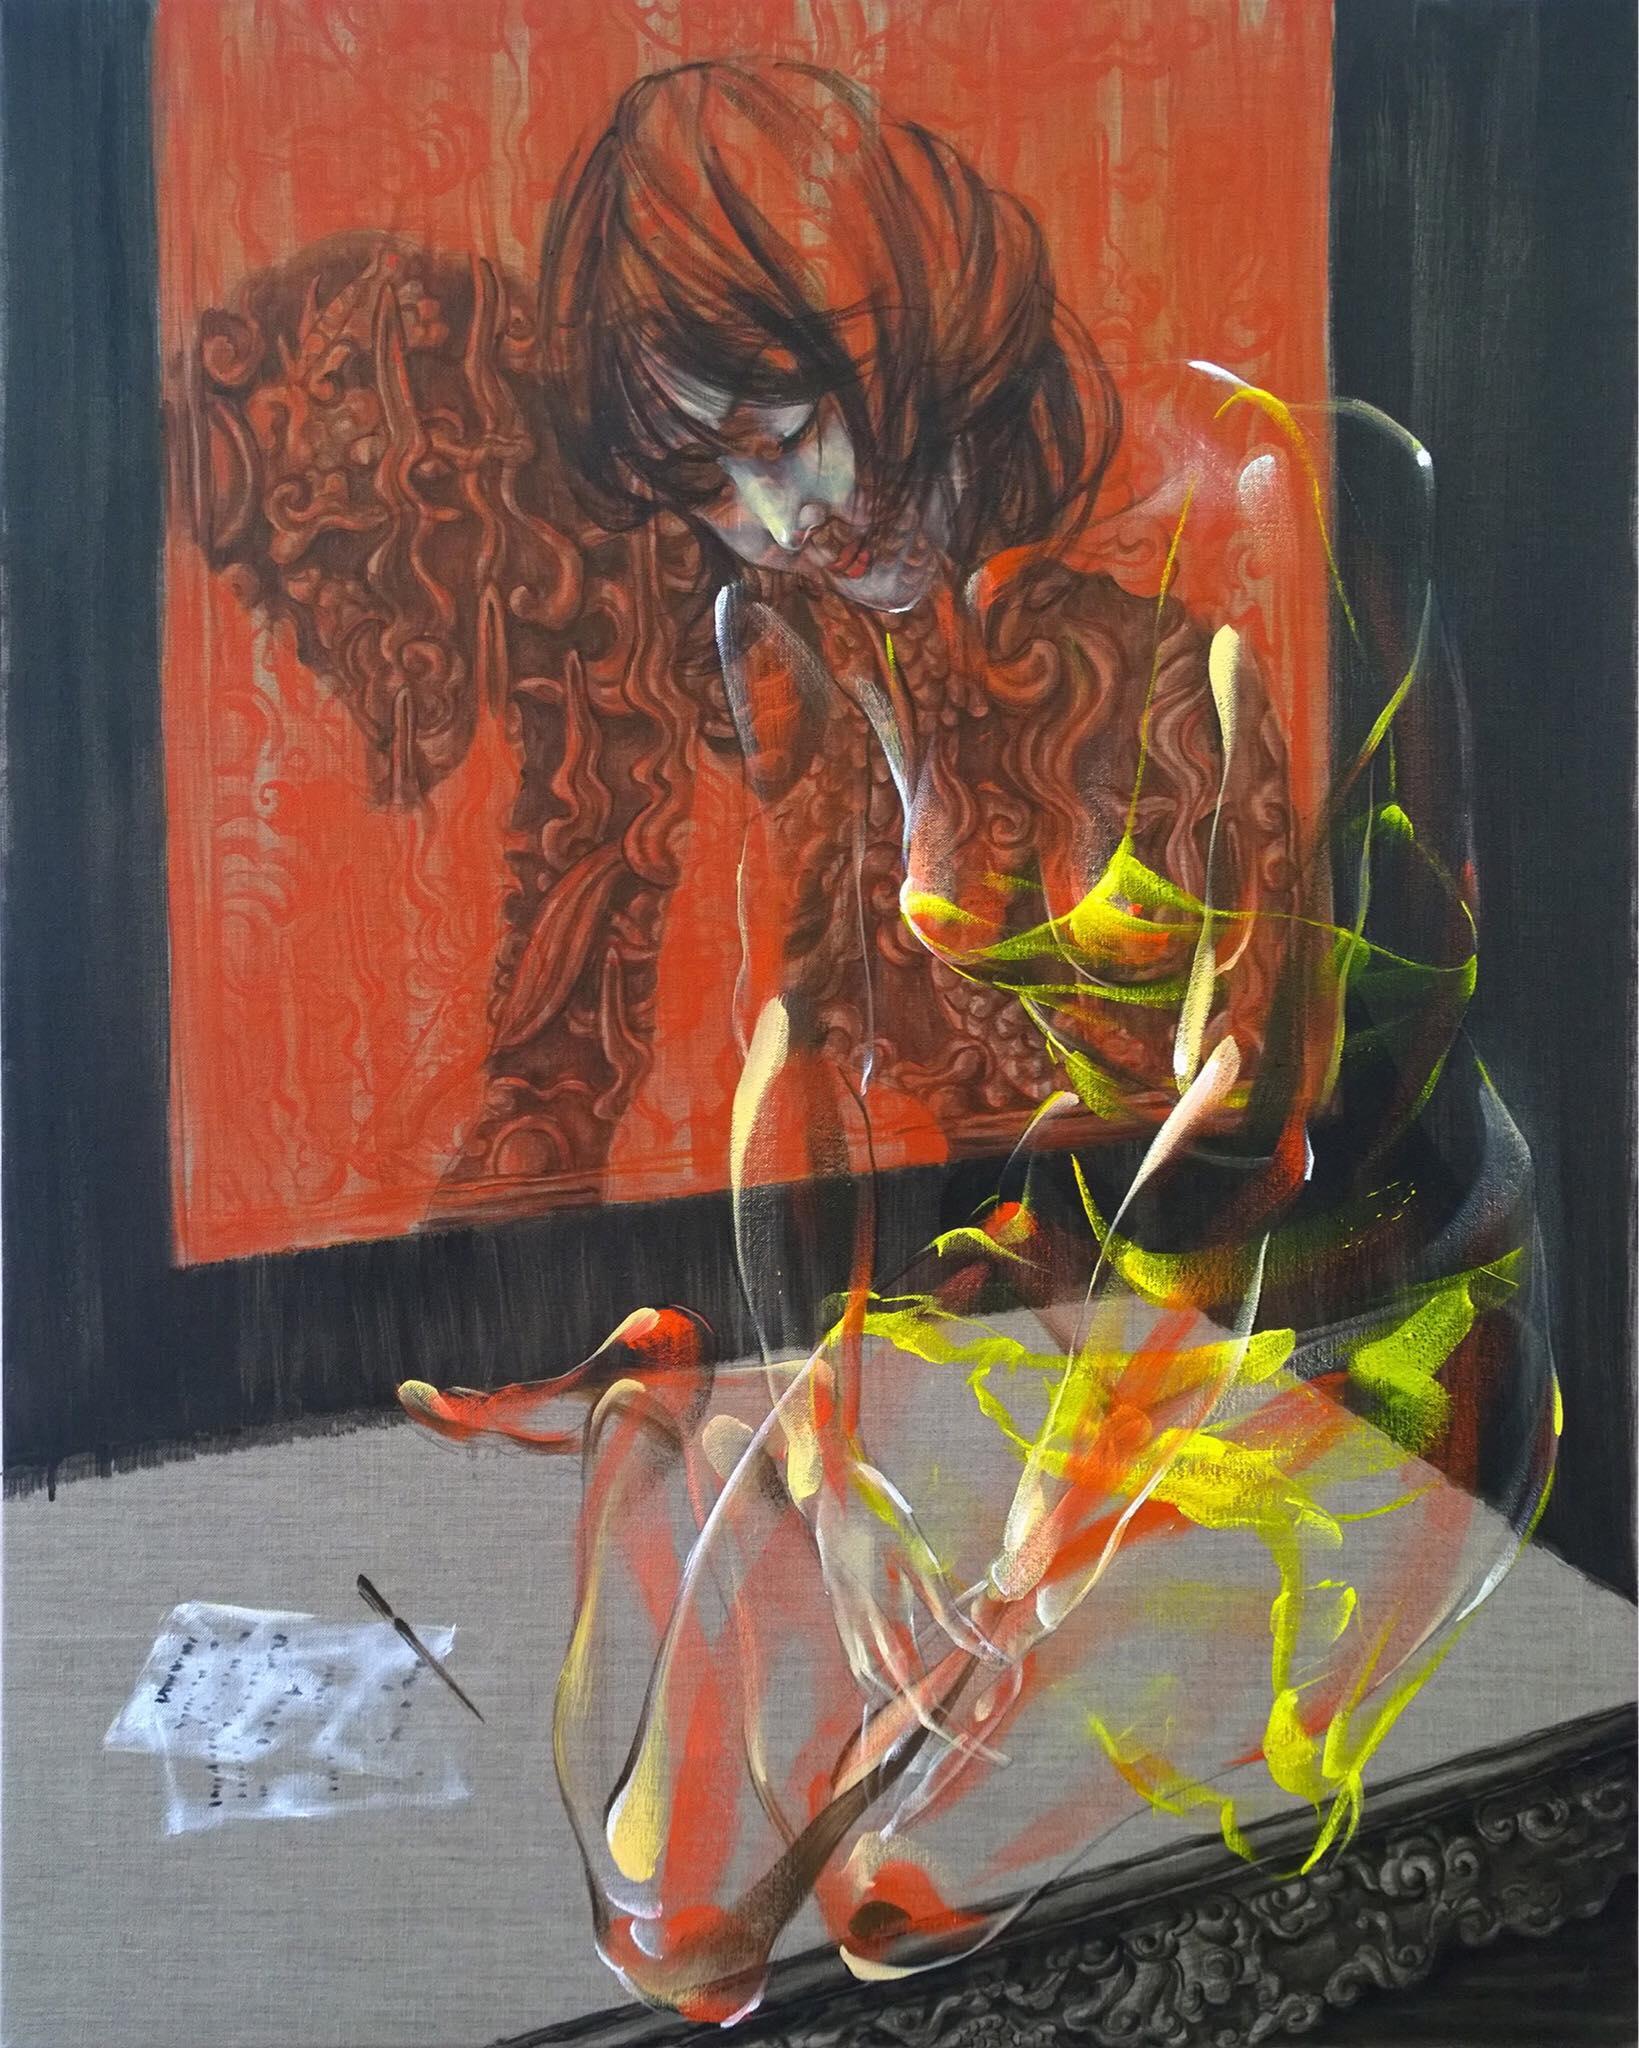 MNN_ Buc Thu_Letter_2017_Oil on canvas_100 x 80 cm